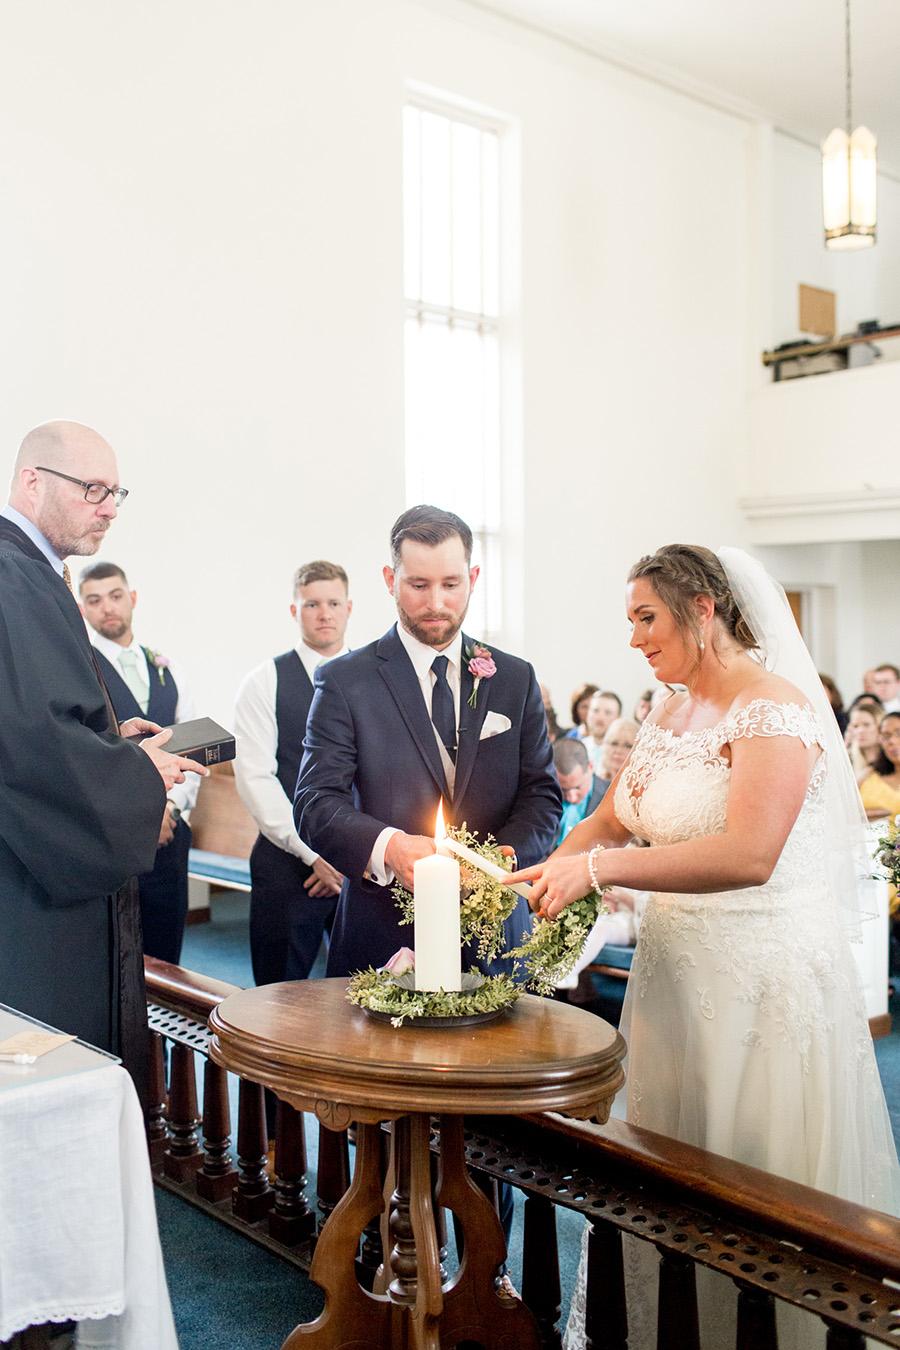 wedding ceremony in sharptown church, new jersey